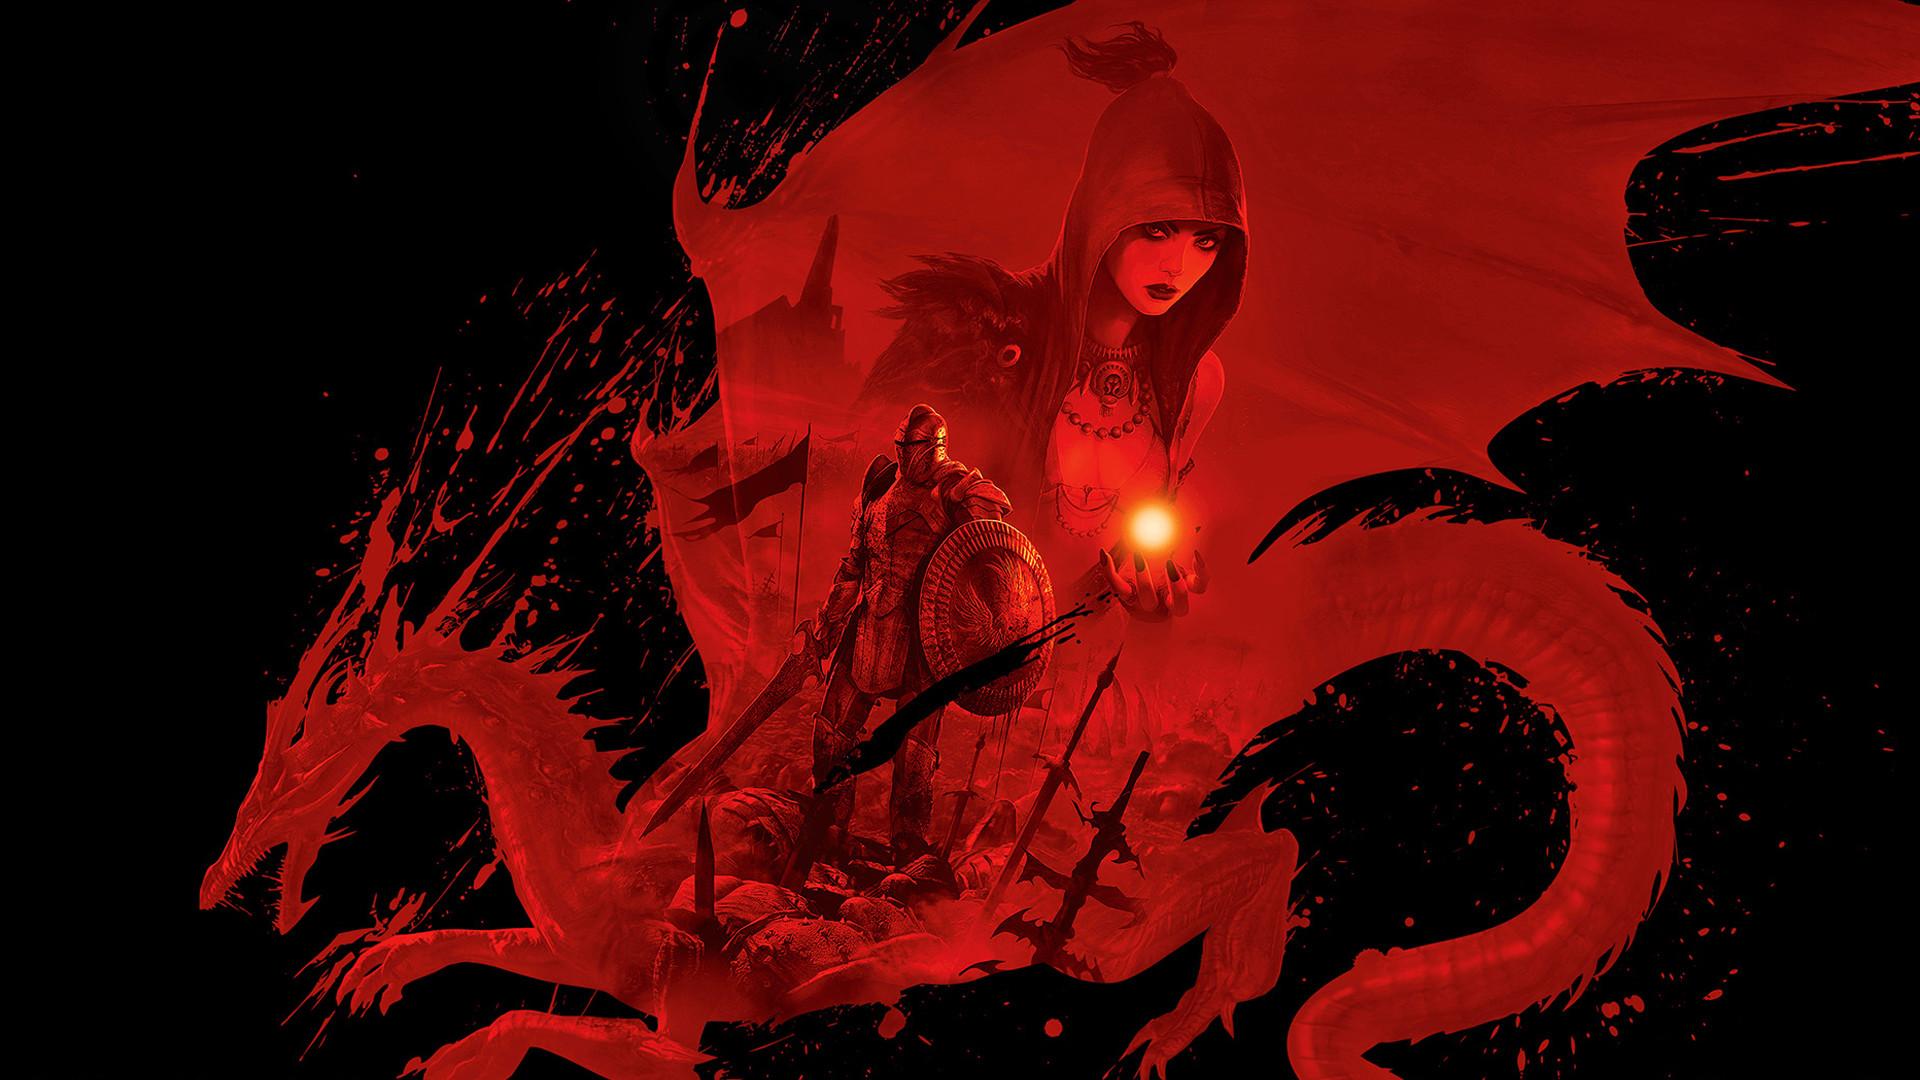 Top 5 Games like Dragon Age #DragonAge https://gazettereview.com/